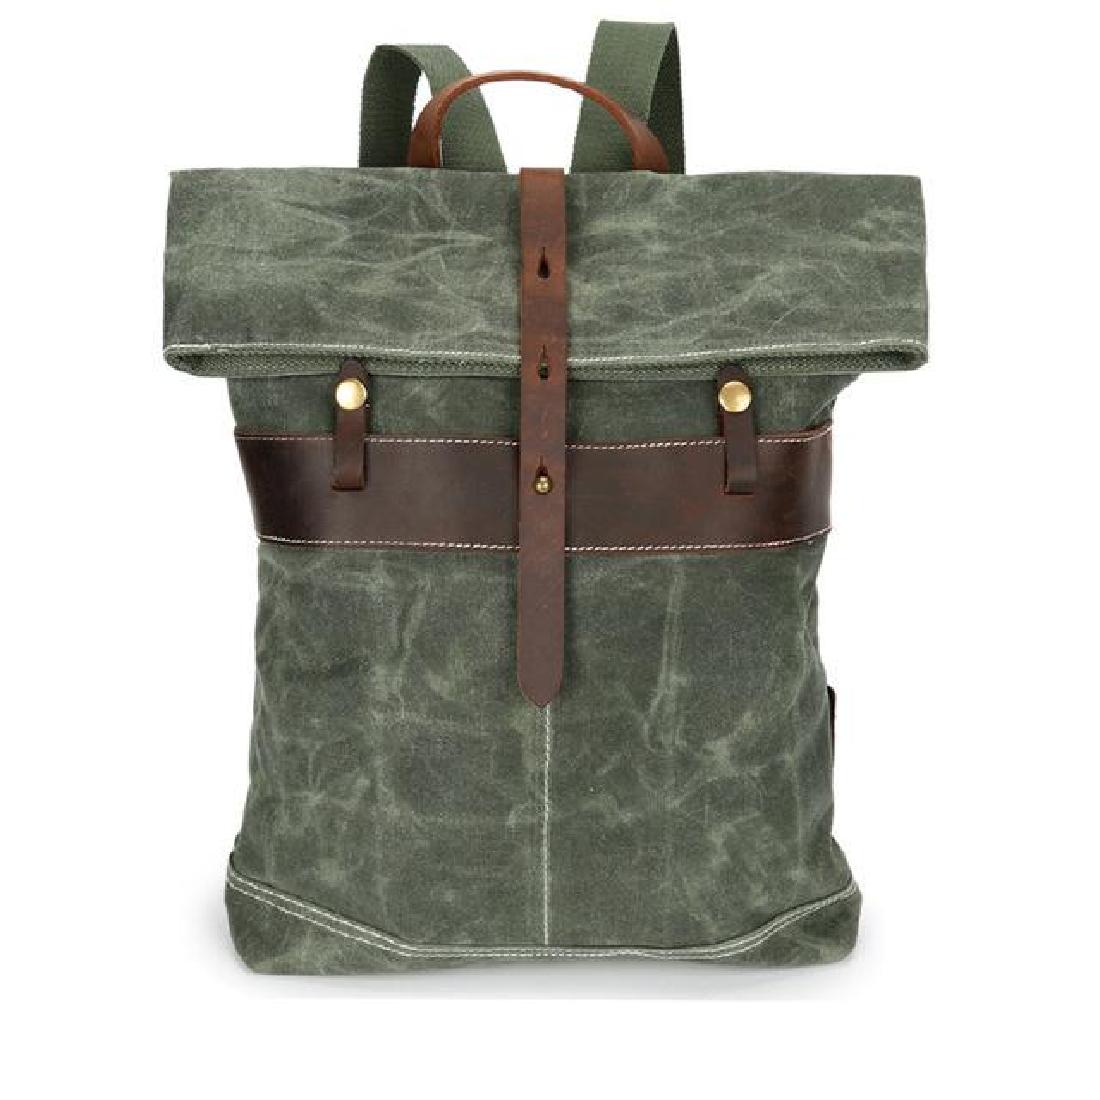 Leather Crazy Horse Backpack Vintage Travel Genuine S Men Bag School Multi  Pockets Zone Bags Sports 3e54b40aebc55